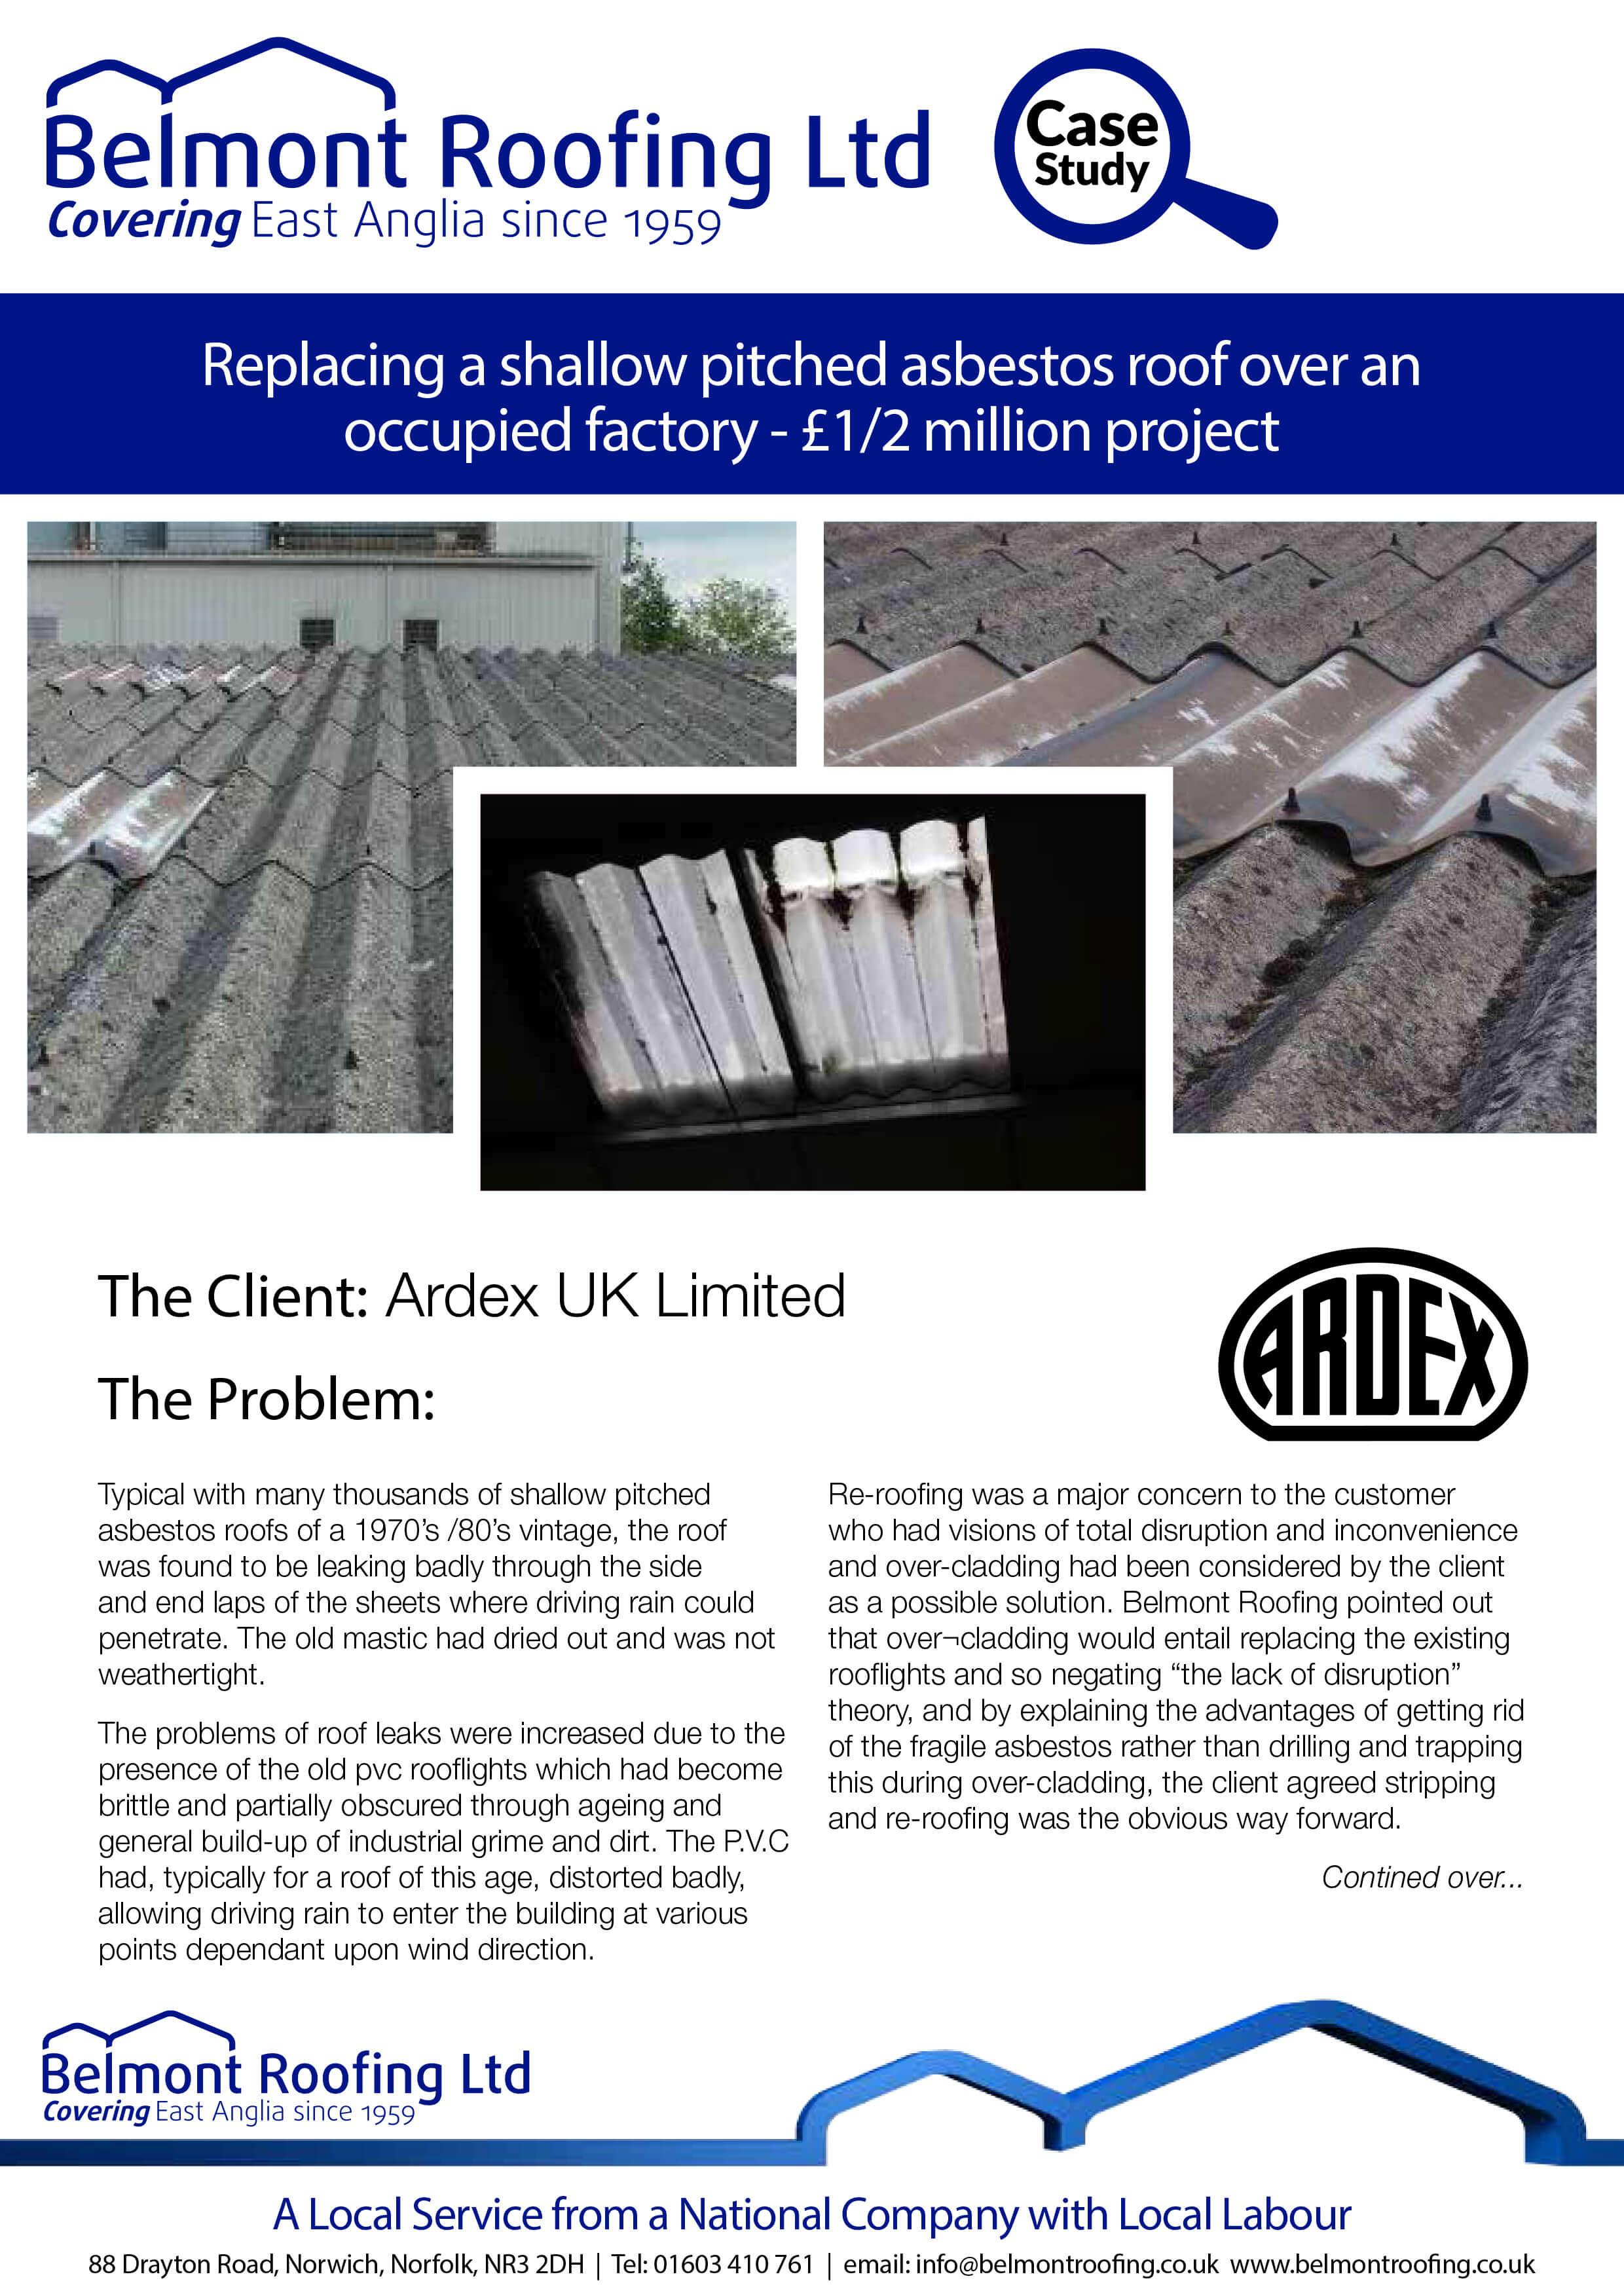 Asbestos Refurbishment Ardex v2 1